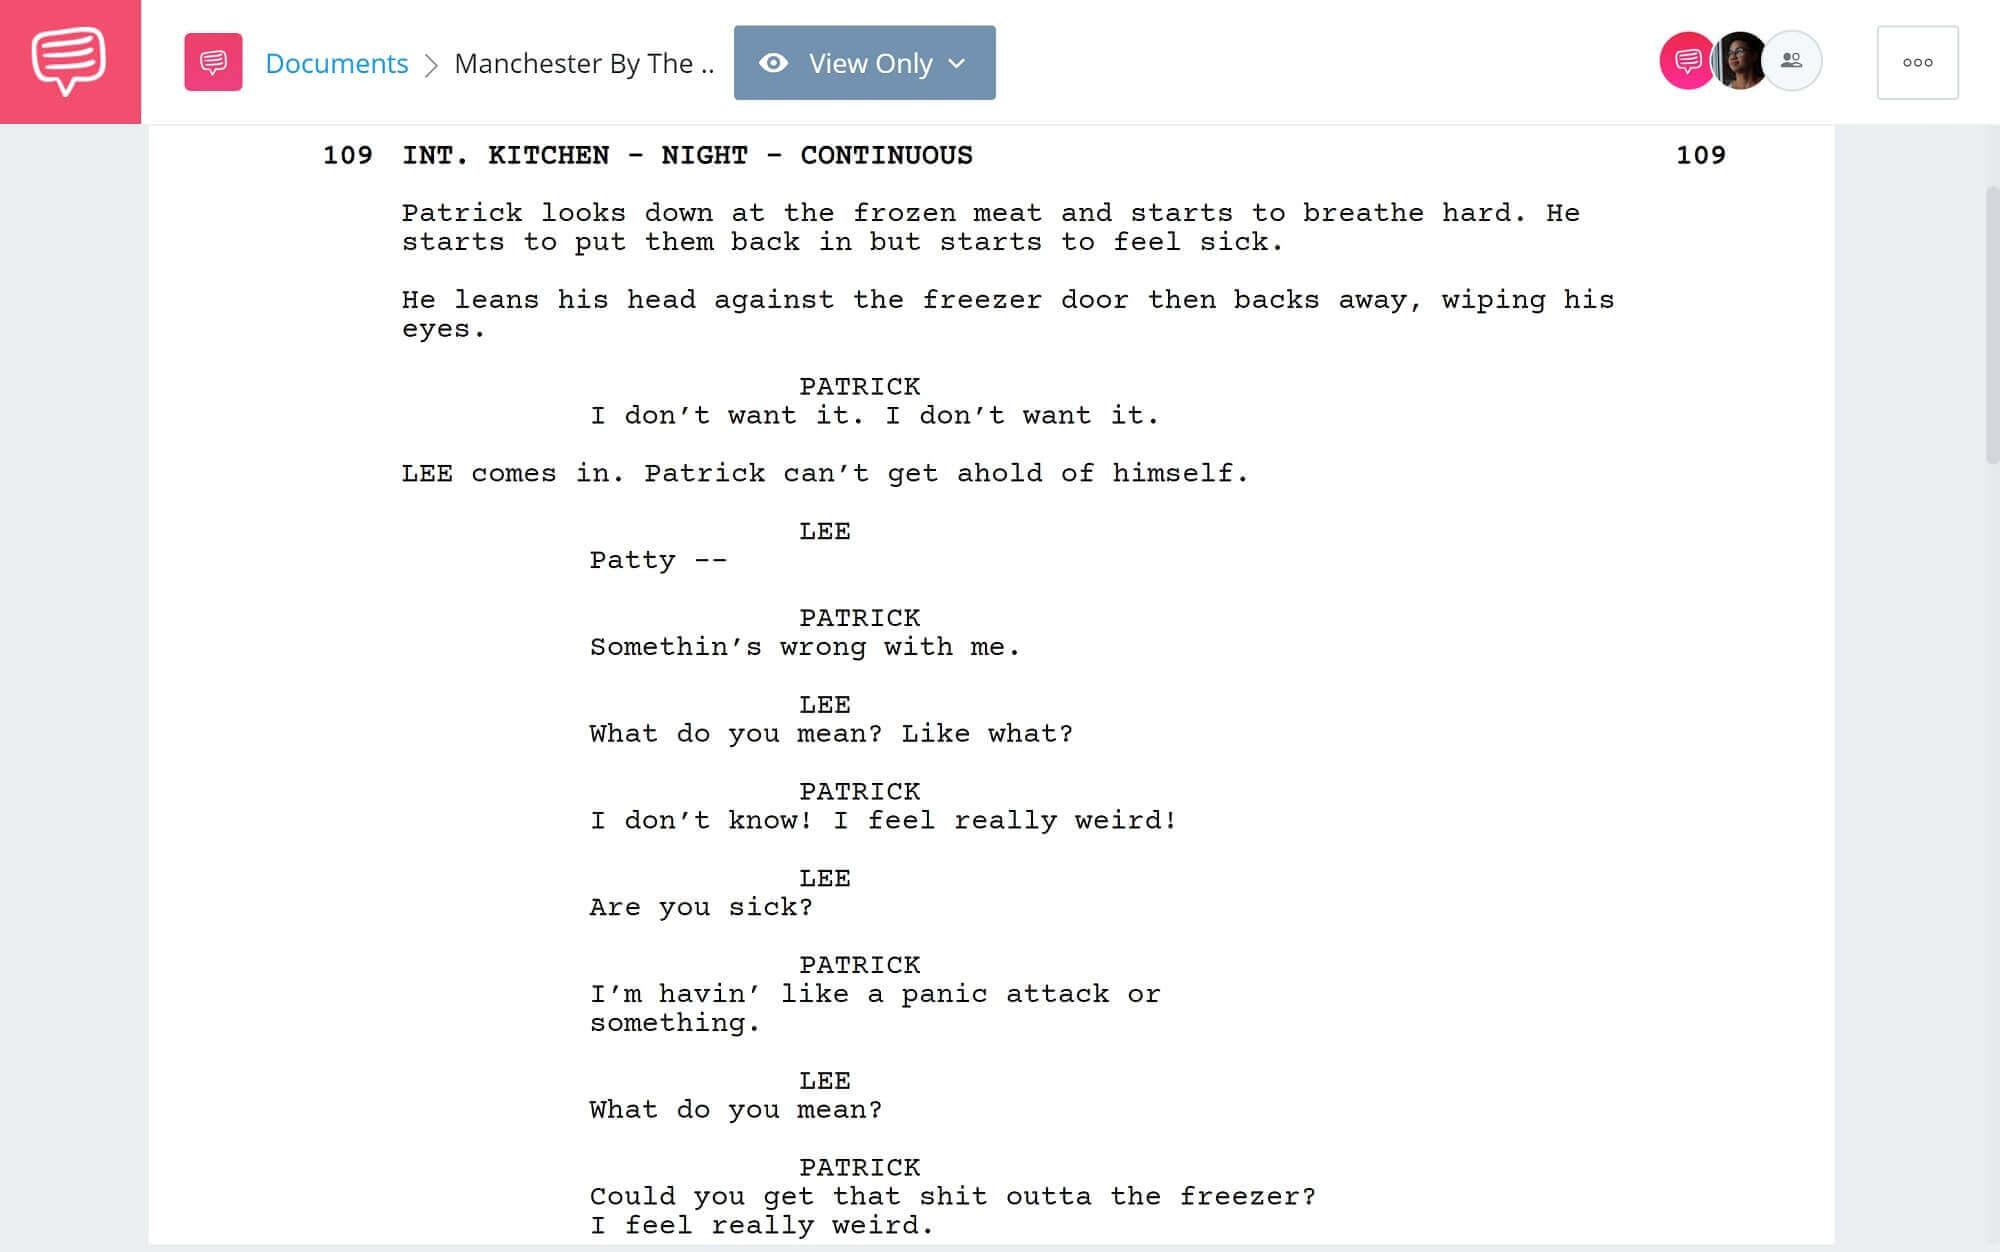 Manchester By The Sea Script Teardown -Patrick's Breakdown- StudioBinder Scriptwriting Software